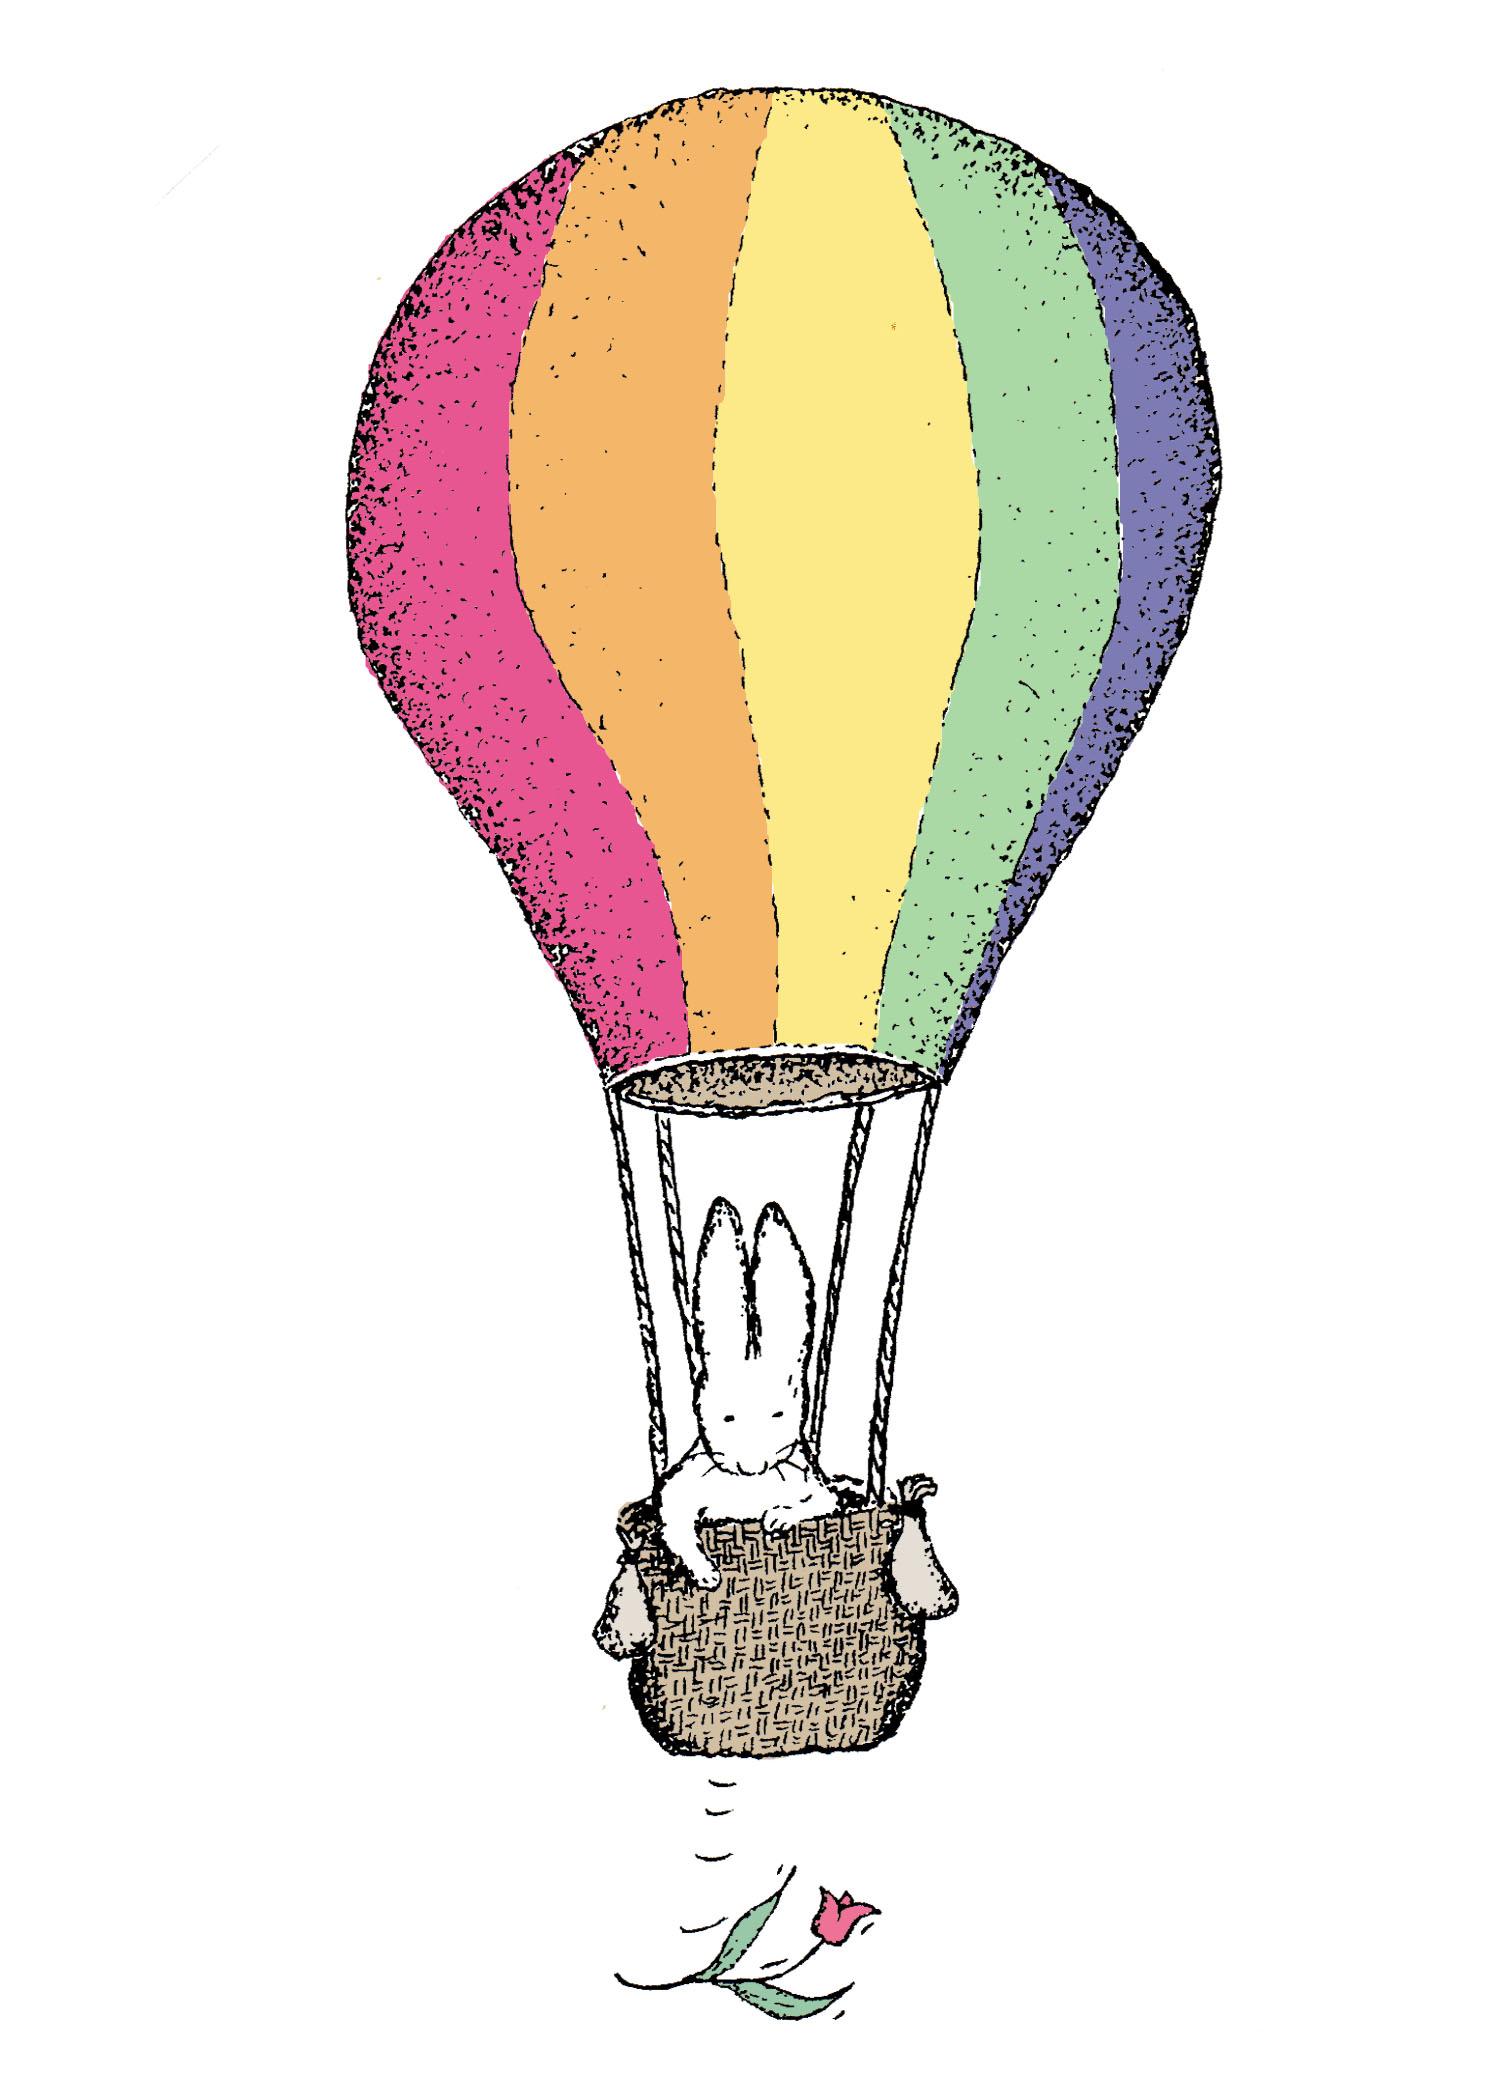 Bunny Balloon by David DeWitt